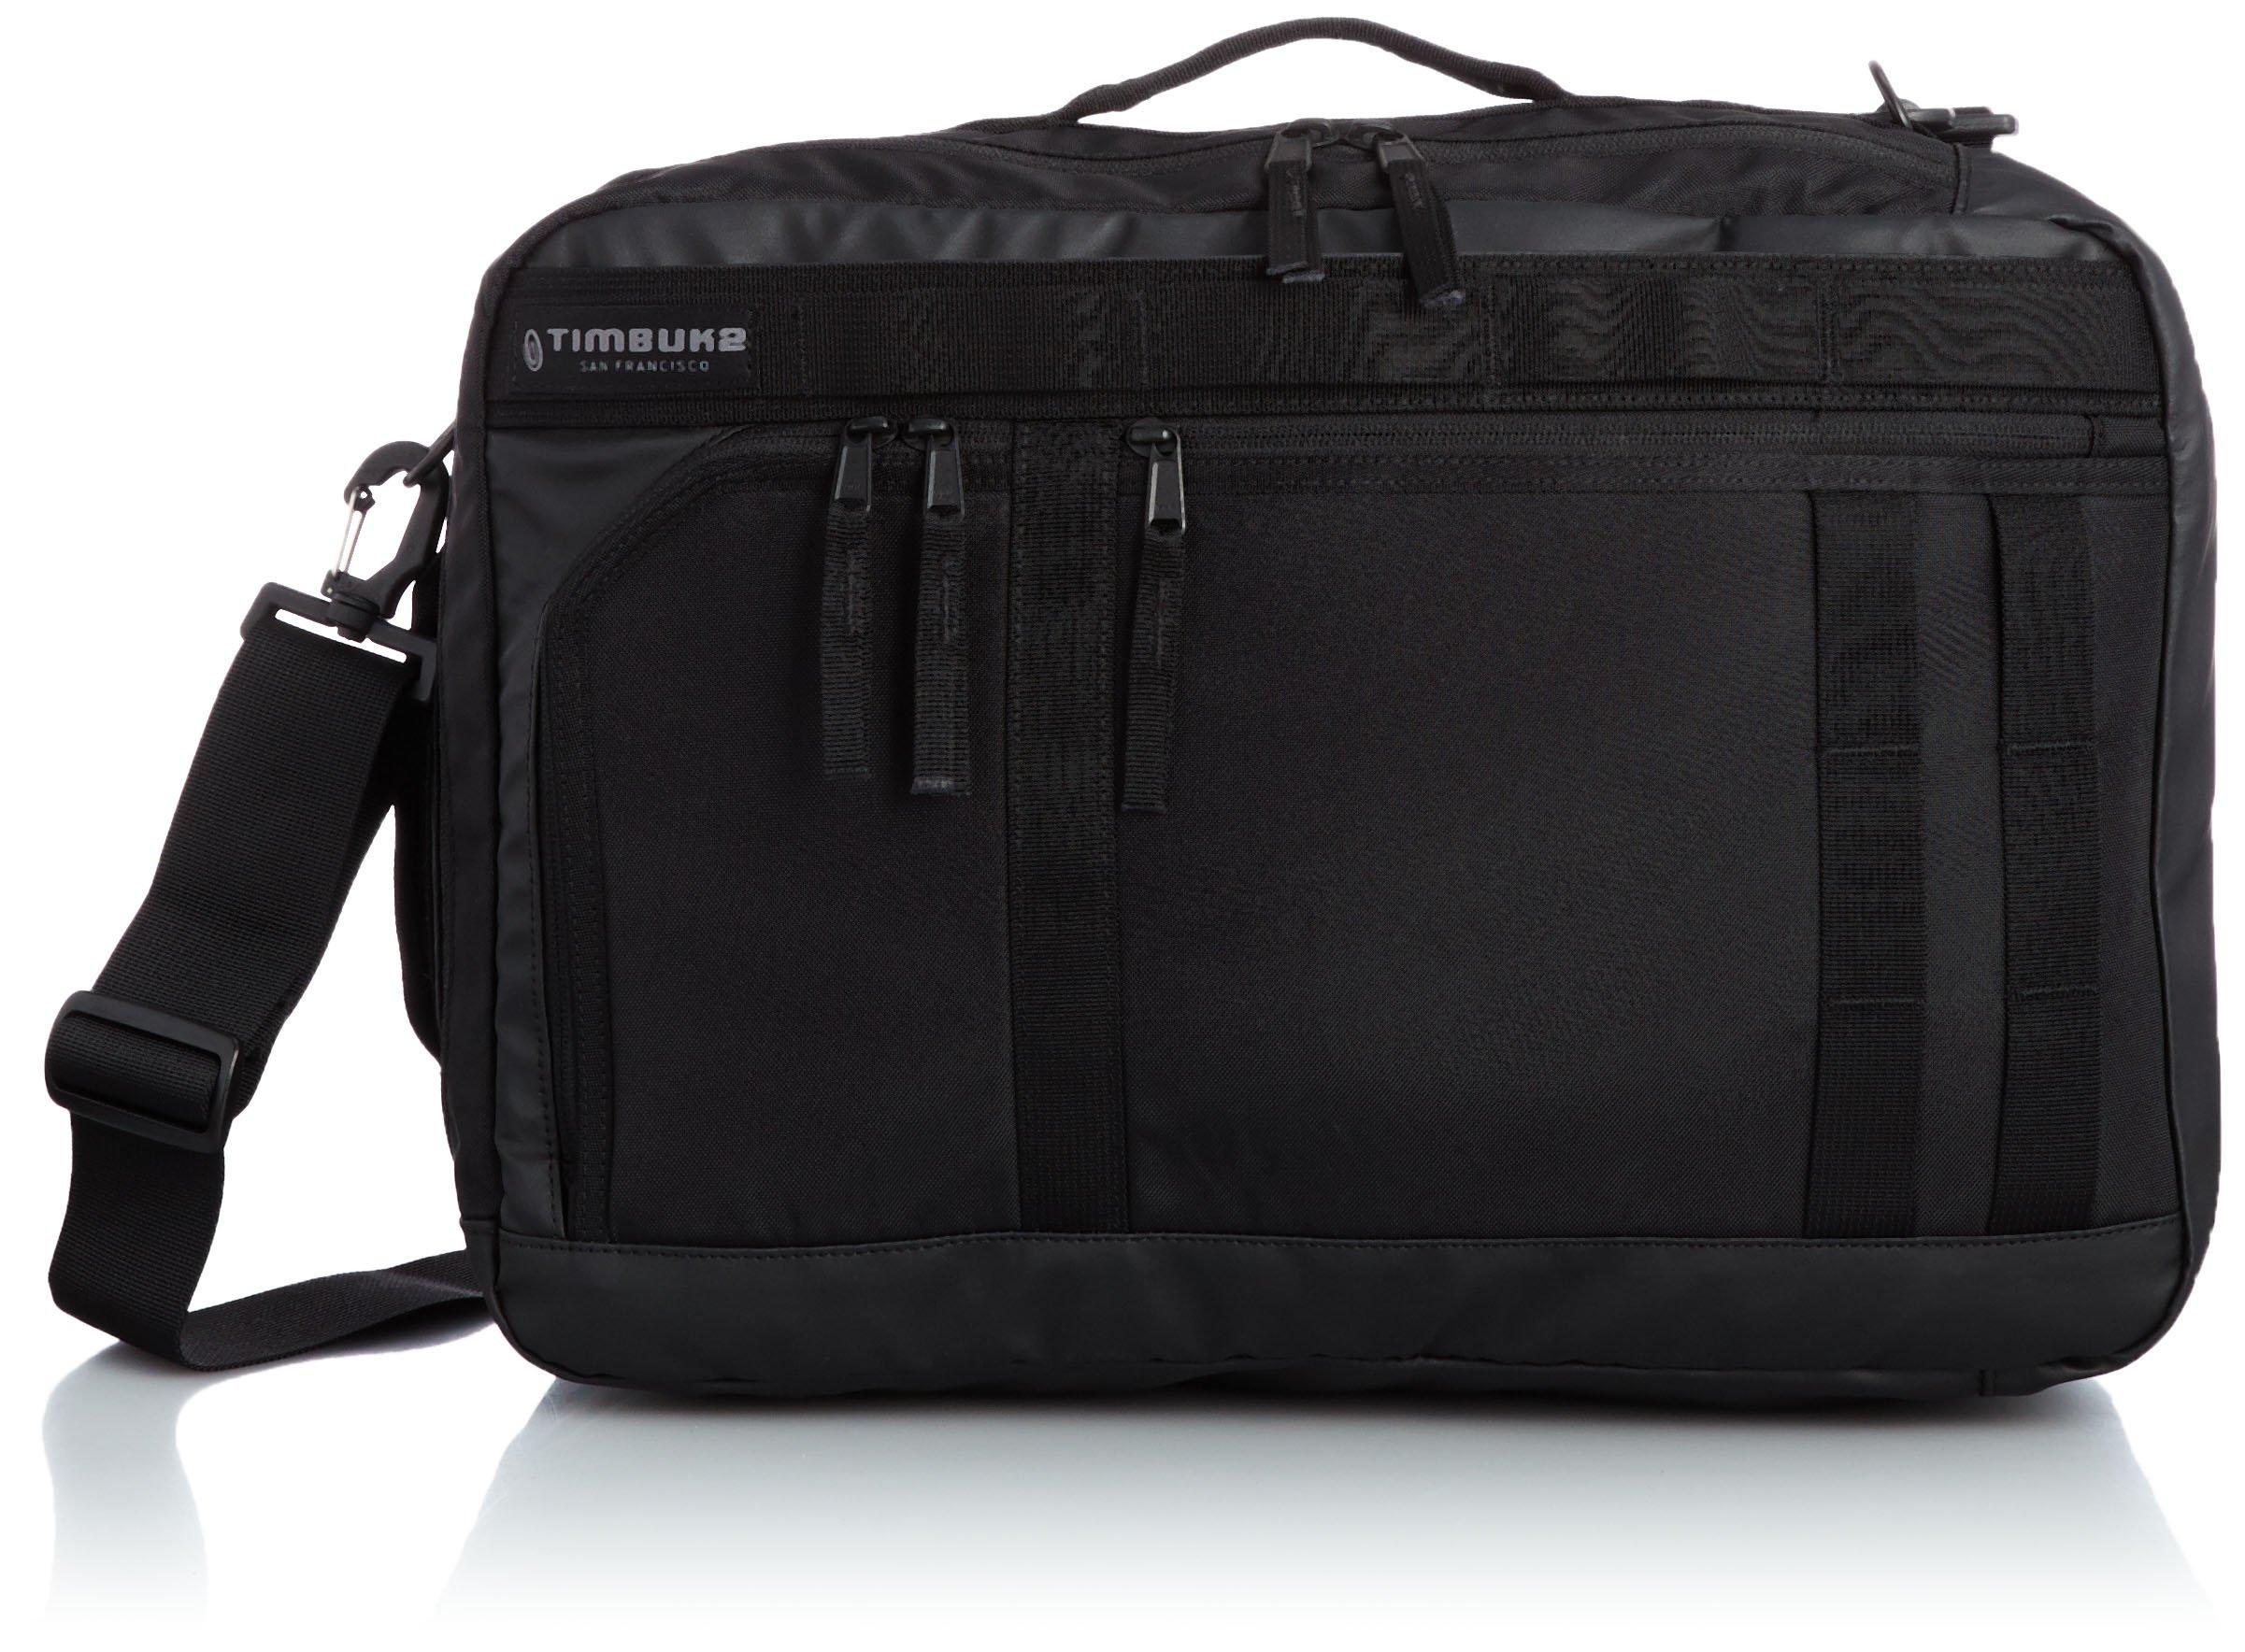 Timbuk2 Ace Daypack, Black, Medium